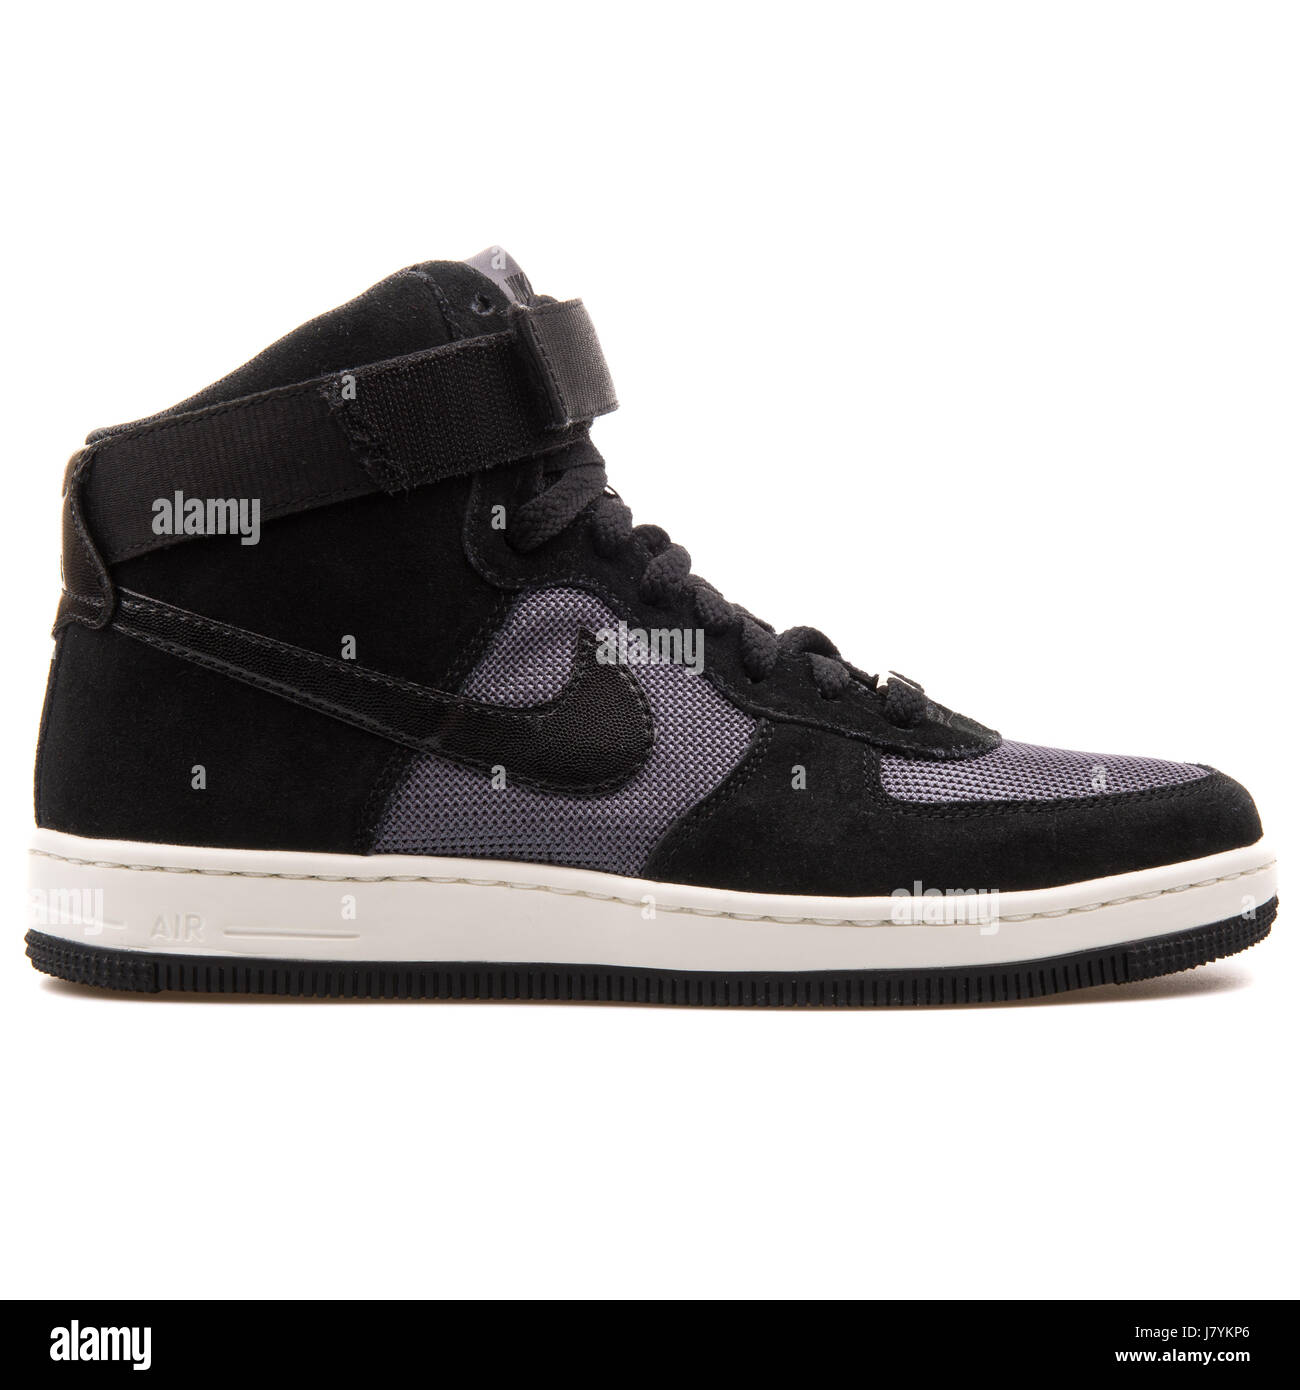 factory price 70e29 ac268 Nike W AF1 Ultra Force Mitte Frauen hohe schwarze Sneaker - 654851-009  Stockbild